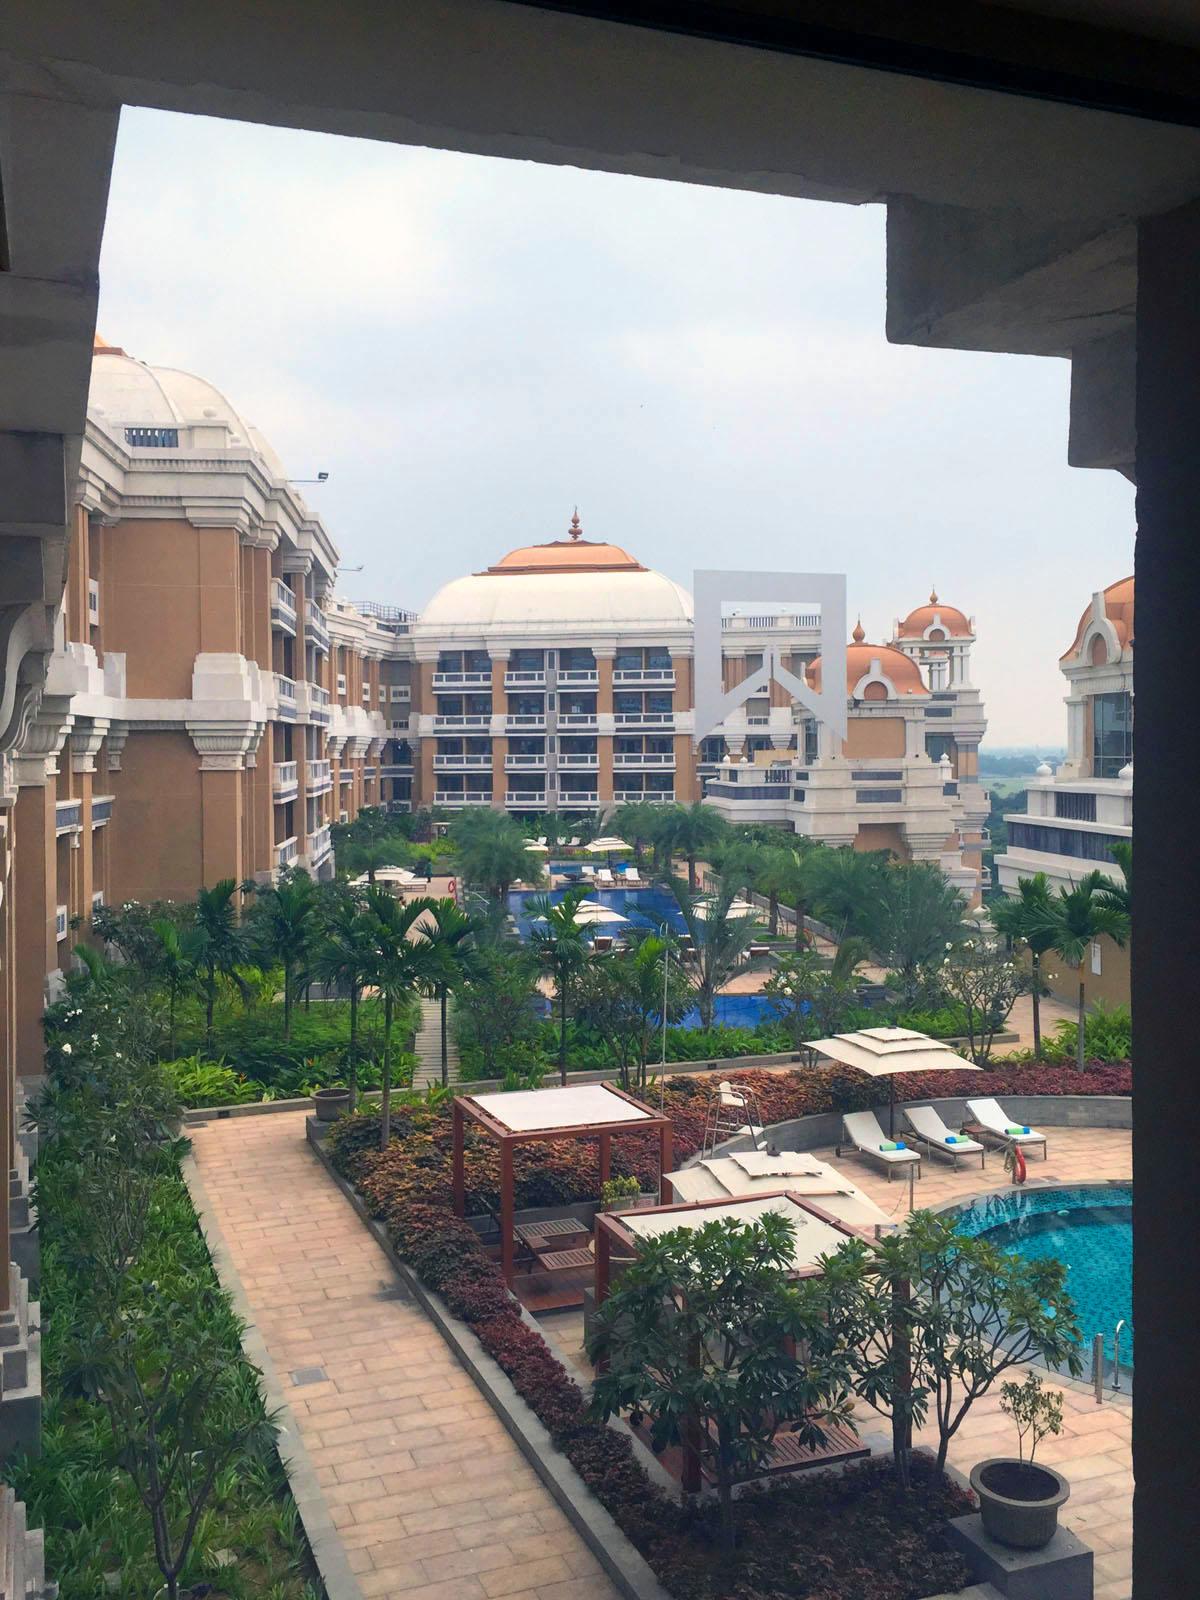 INDIEN_ITC_Grand_Chola_Hotel_Chennai_FINEST-onTour_1892.jpg